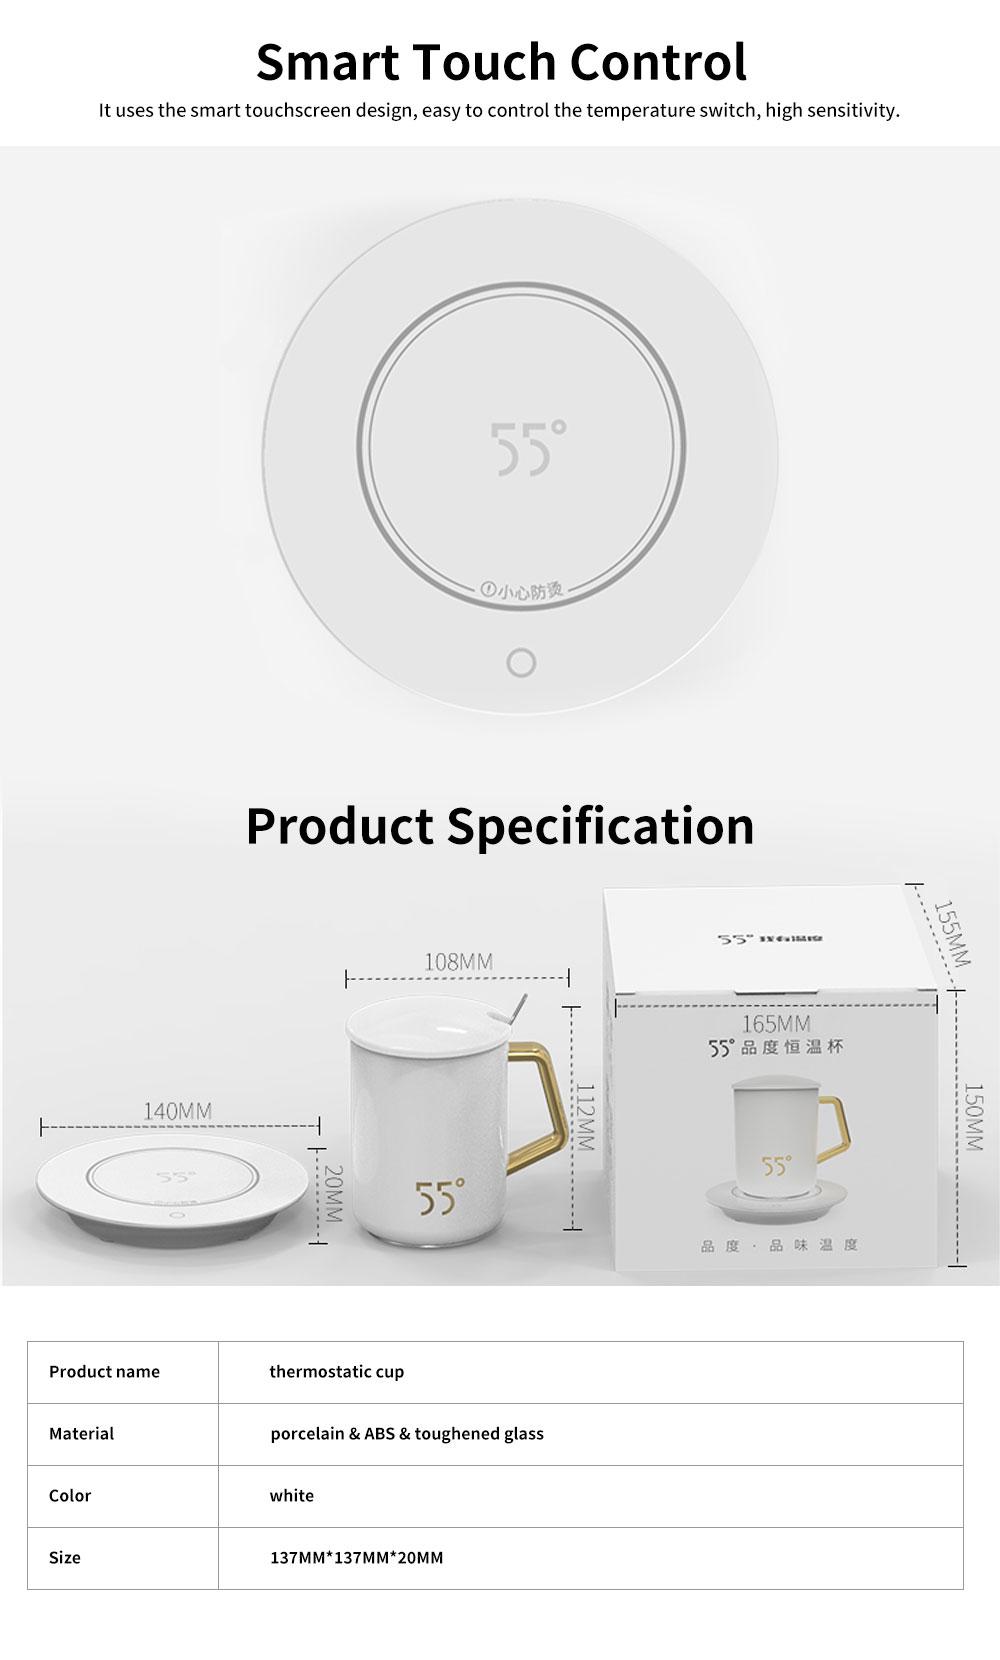 55 Degree Thermostatic Mug Heating Warmer for Hot Milk, Warm Tea, Warm Coffee, Warm Water 5